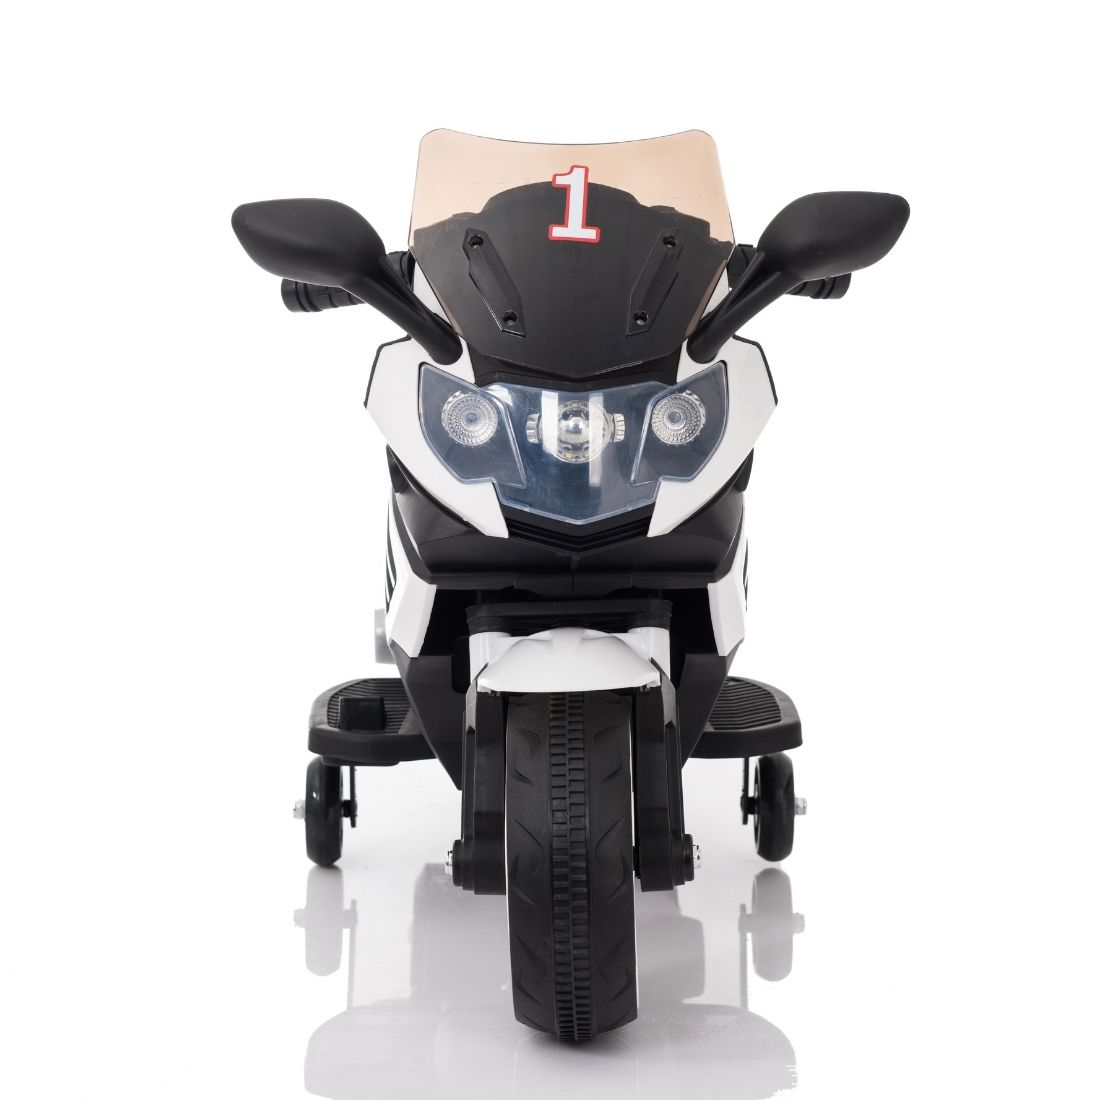 Brinquedo Mini Moto Bicicleta Elétrica Infantil Motorizada